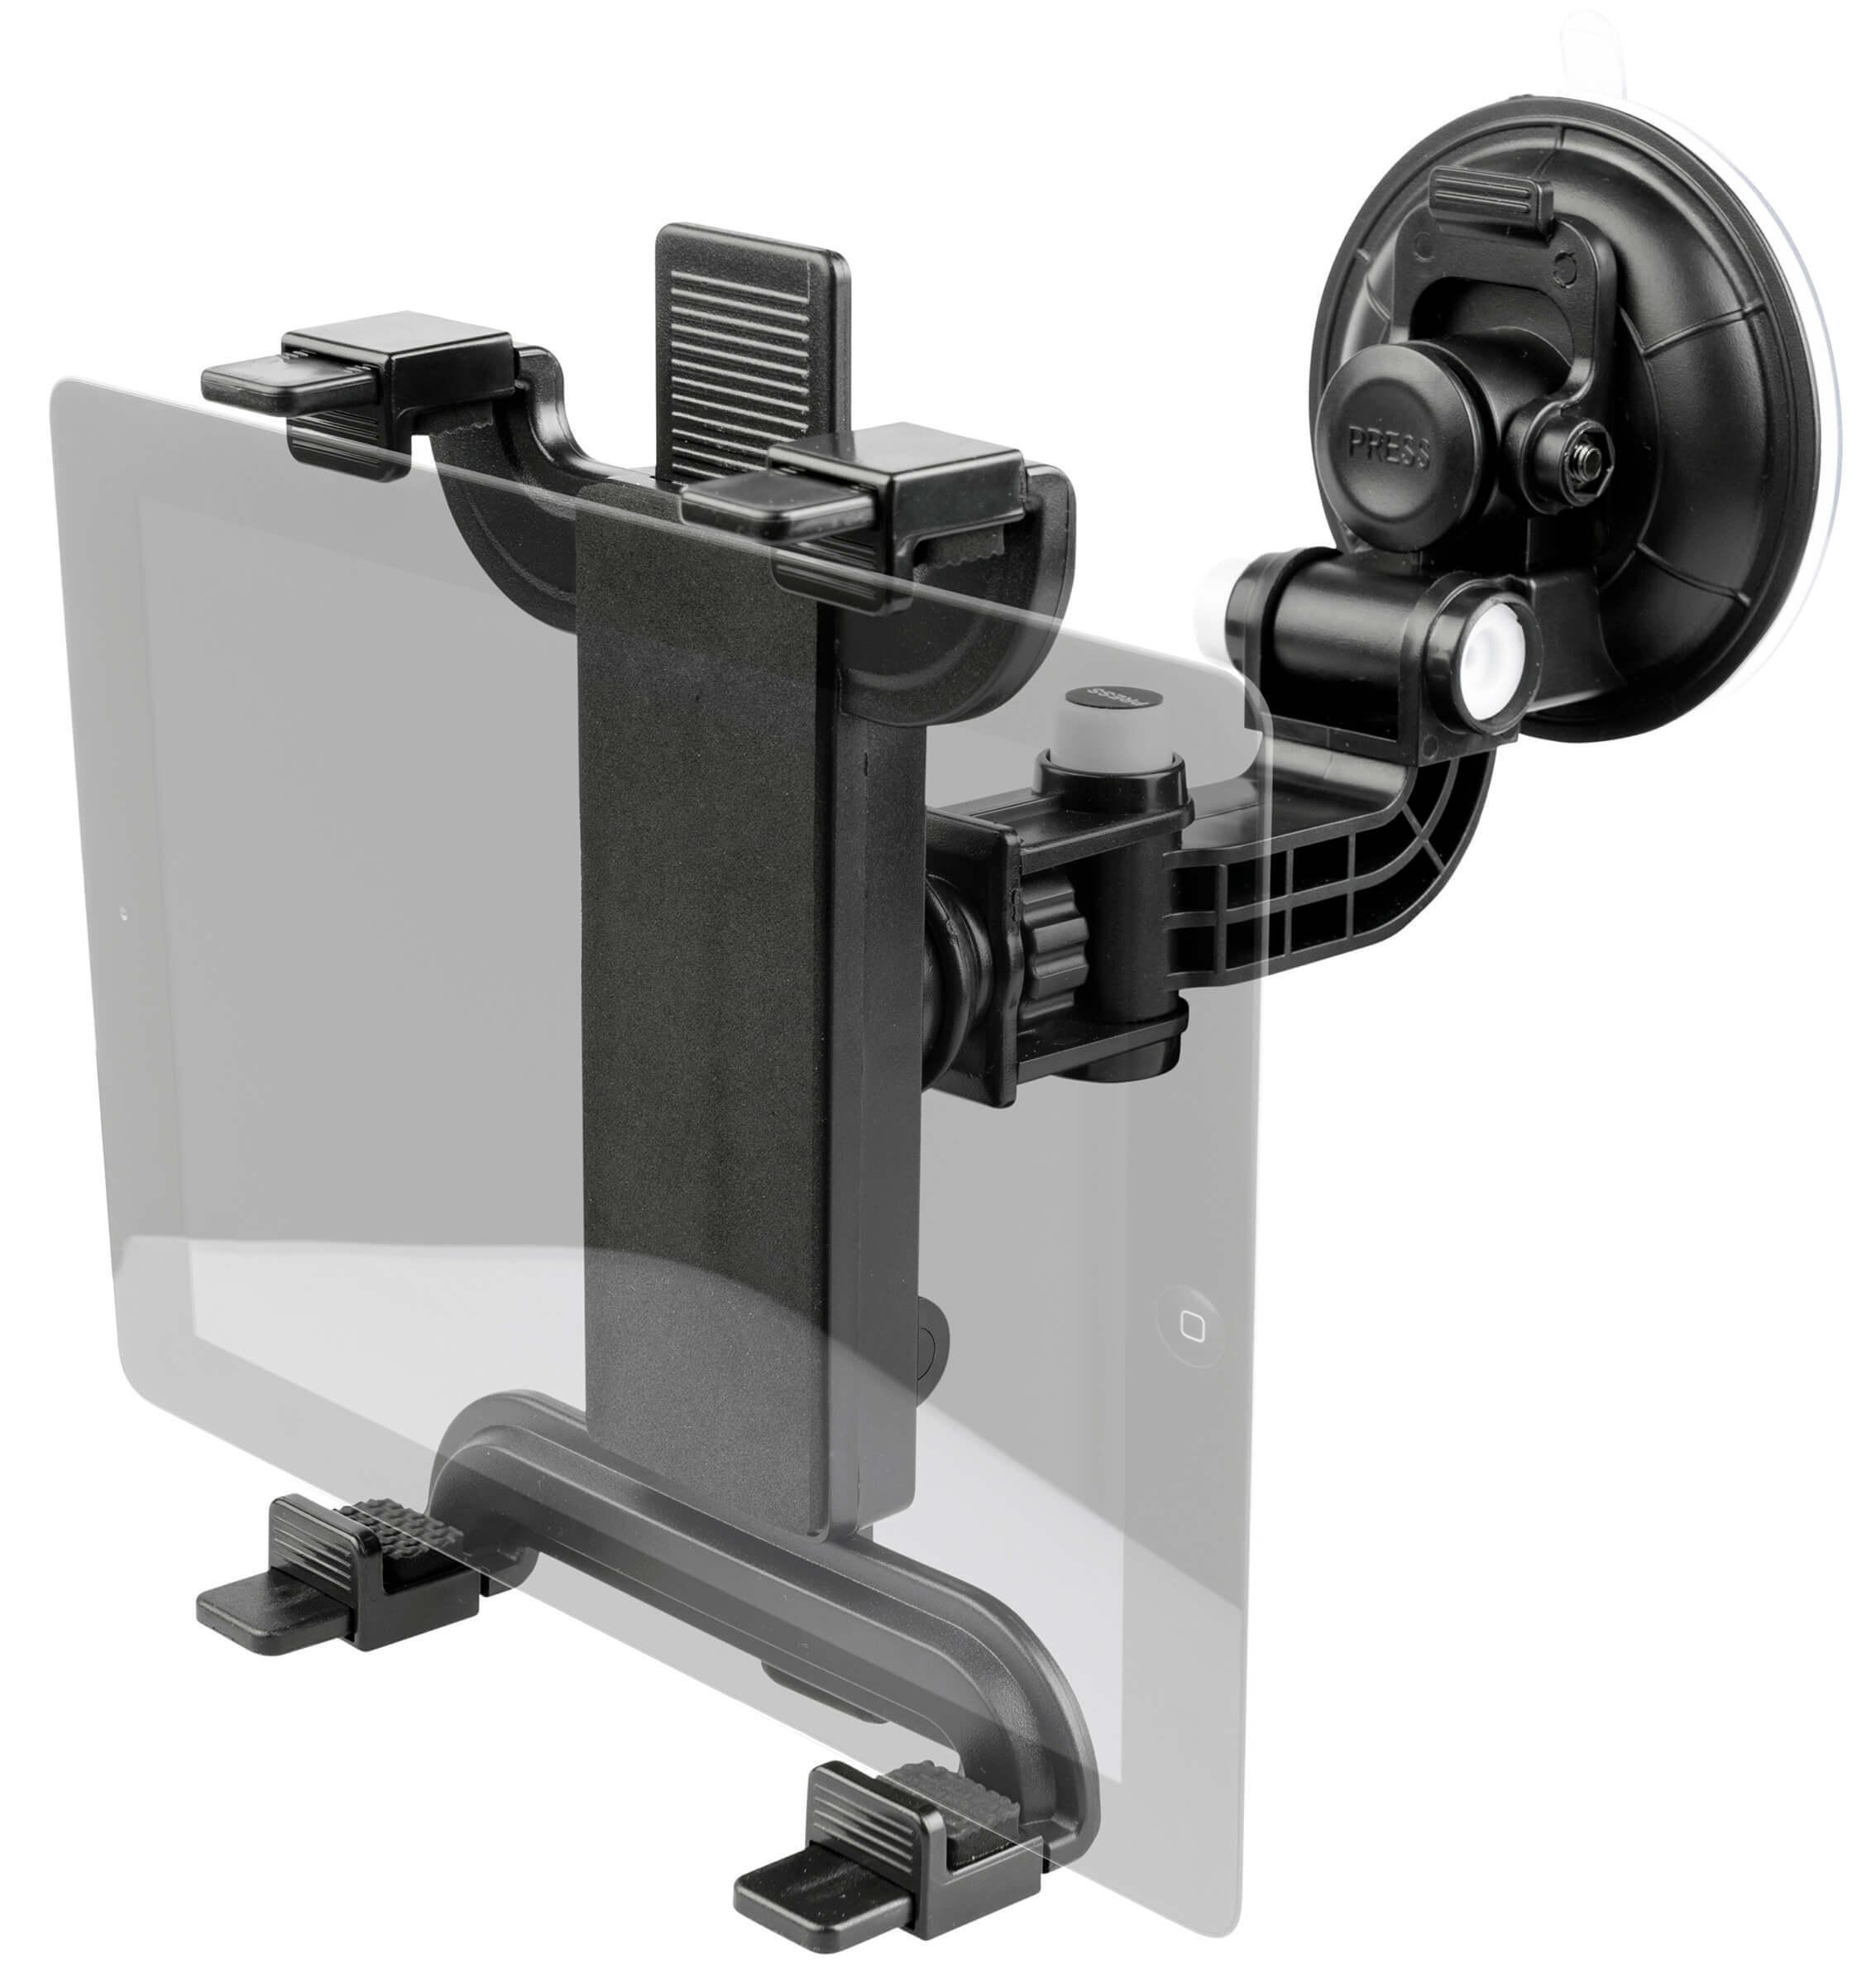 premium auto tablet halterung f r pkw mit saugnapf bis 10 zoll ipad galaxy ebay. Black Bedroom Furniture Sets. Home Design Ideas